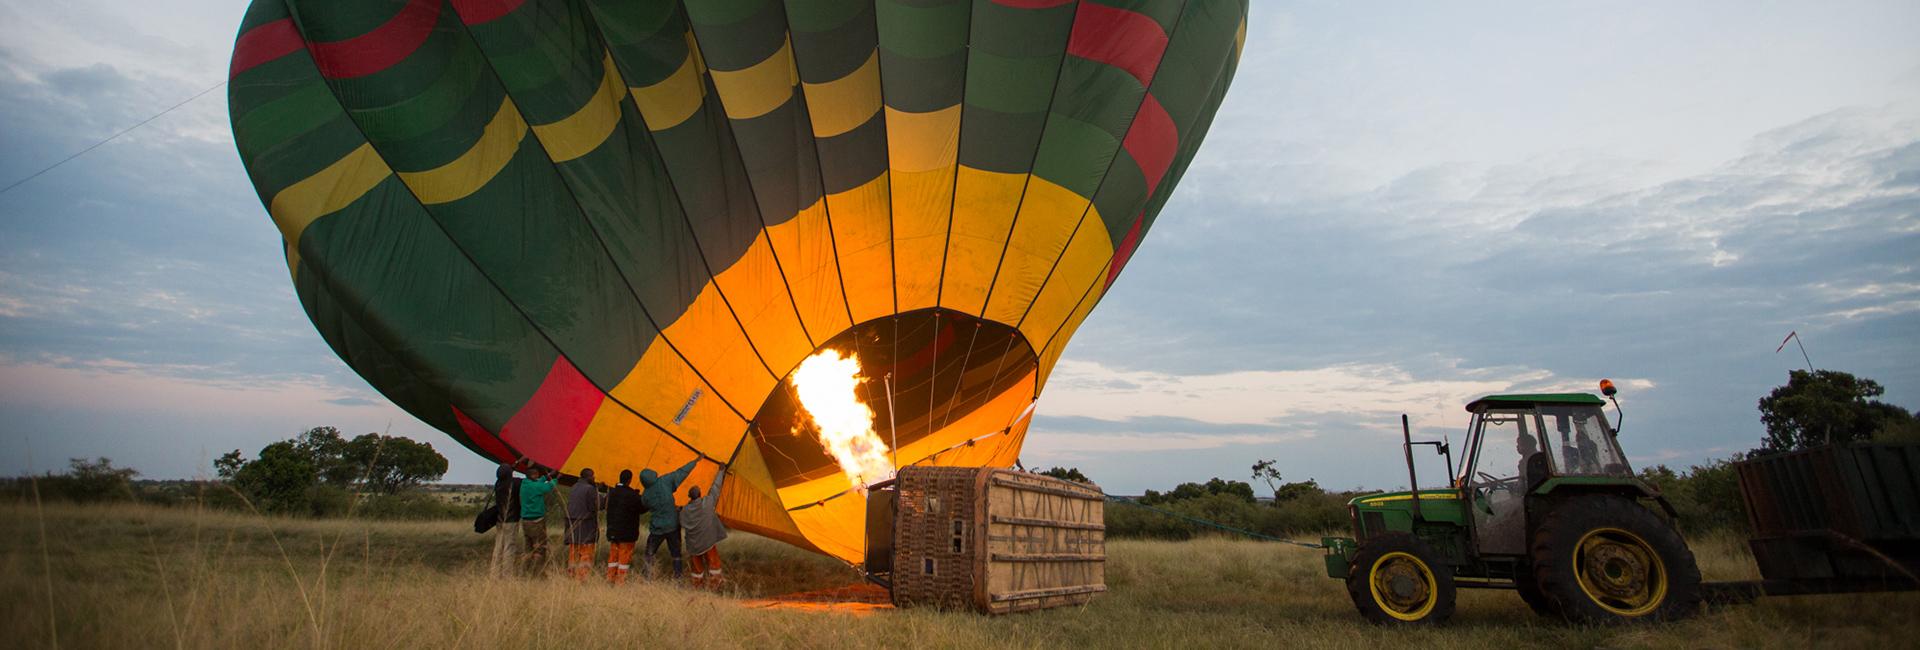 Balloon Safaris Launch Iconic Africa Tanzania